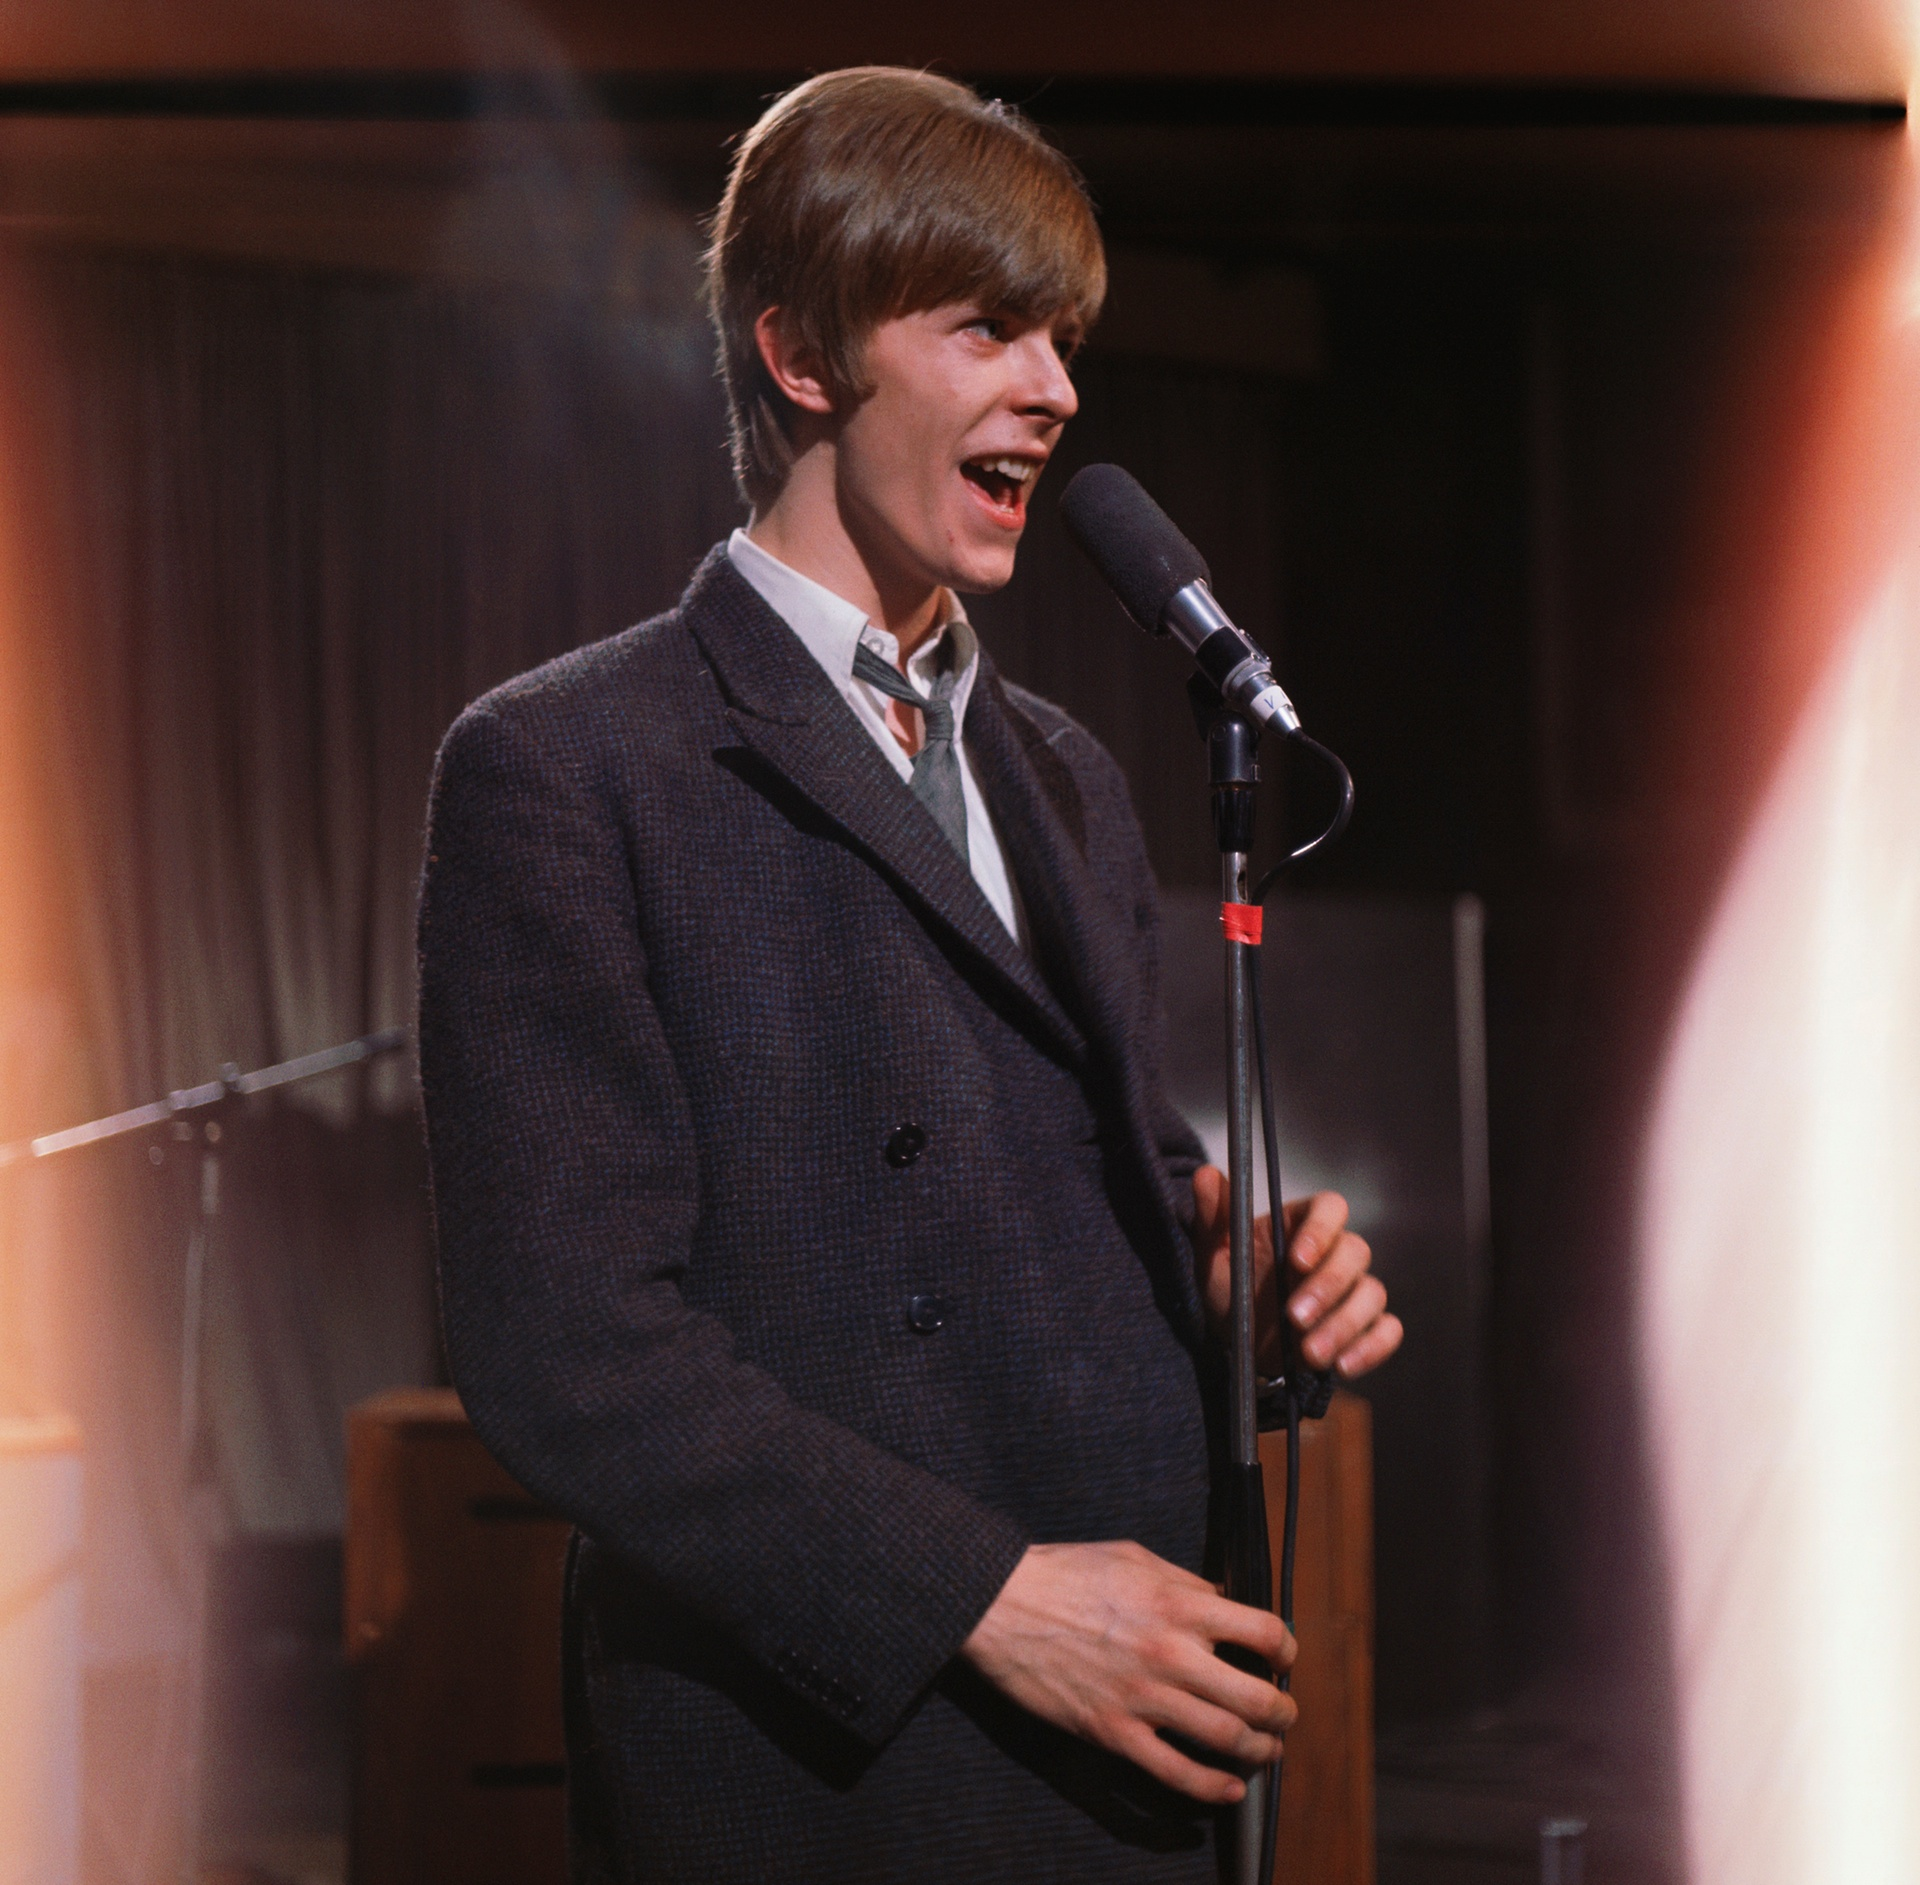 Дейвид Бауи в британското телевизионно шоу, Ready, Steady, Go през 1966 г. Снимка: : :ichael Ochs / Corbis